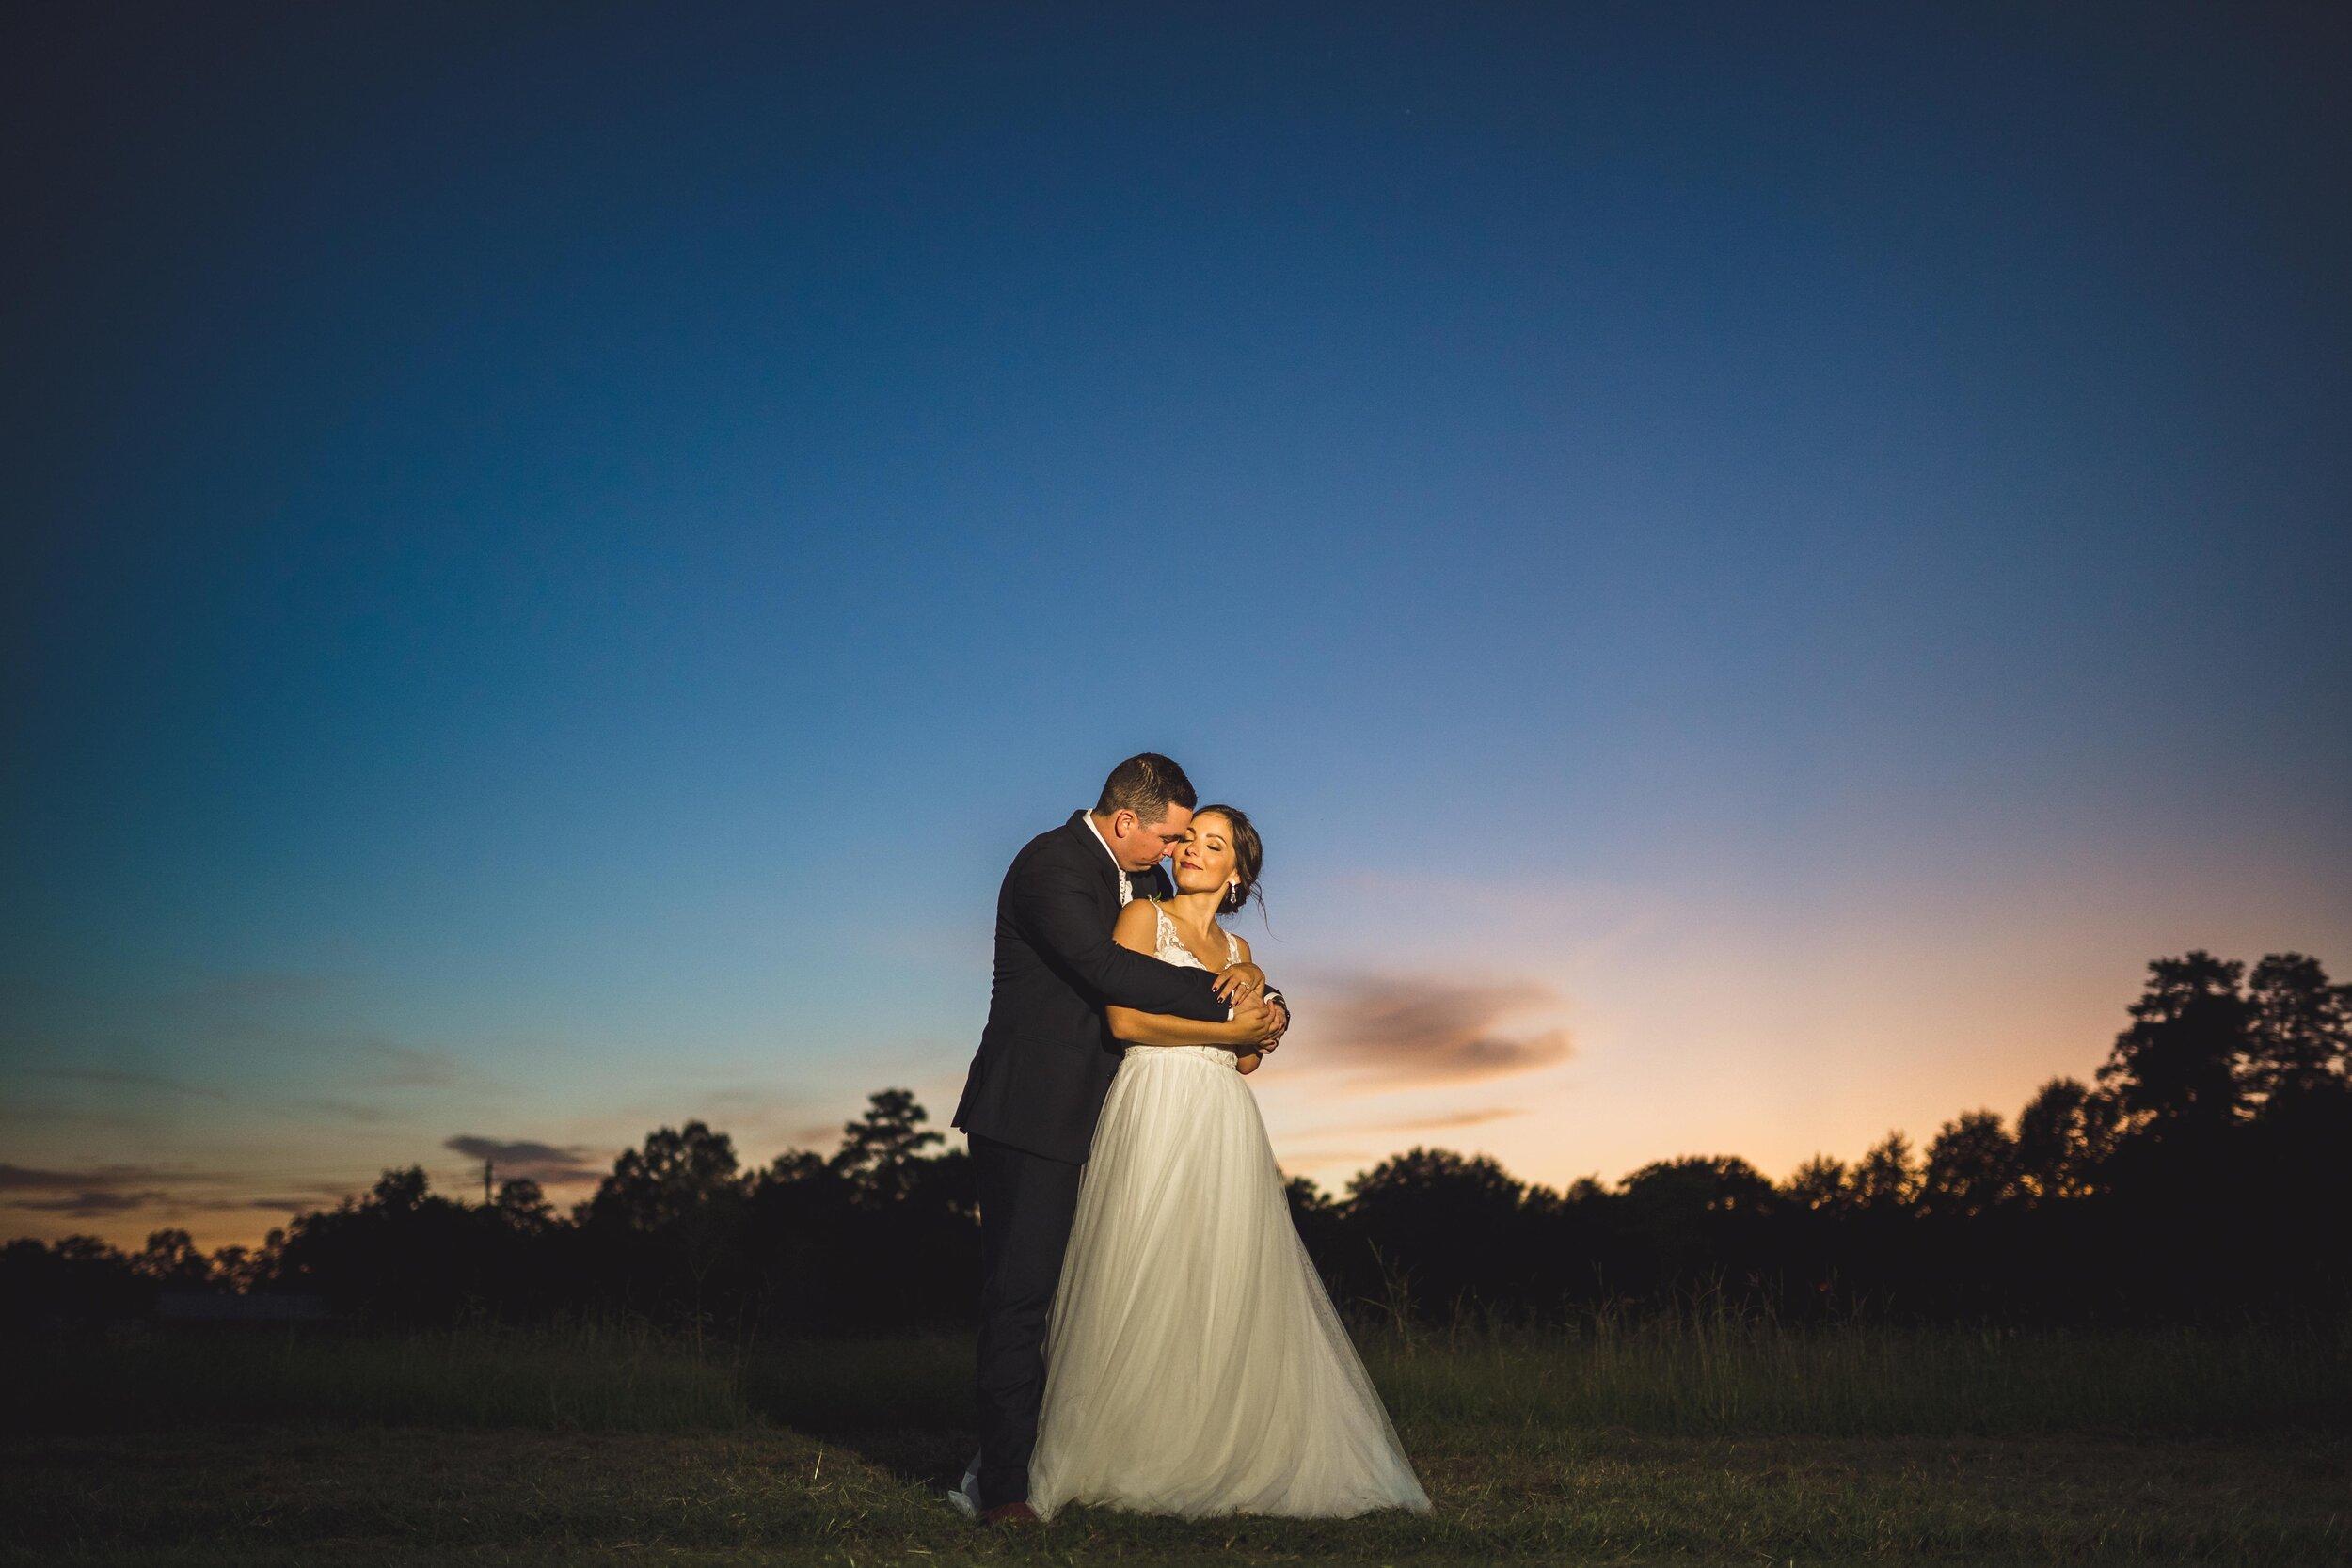 houston-wedding-photographer-photographers-photography-conroe-texas-planner-best-top-vendor-pine-lake-ranch-photos-1.jpg